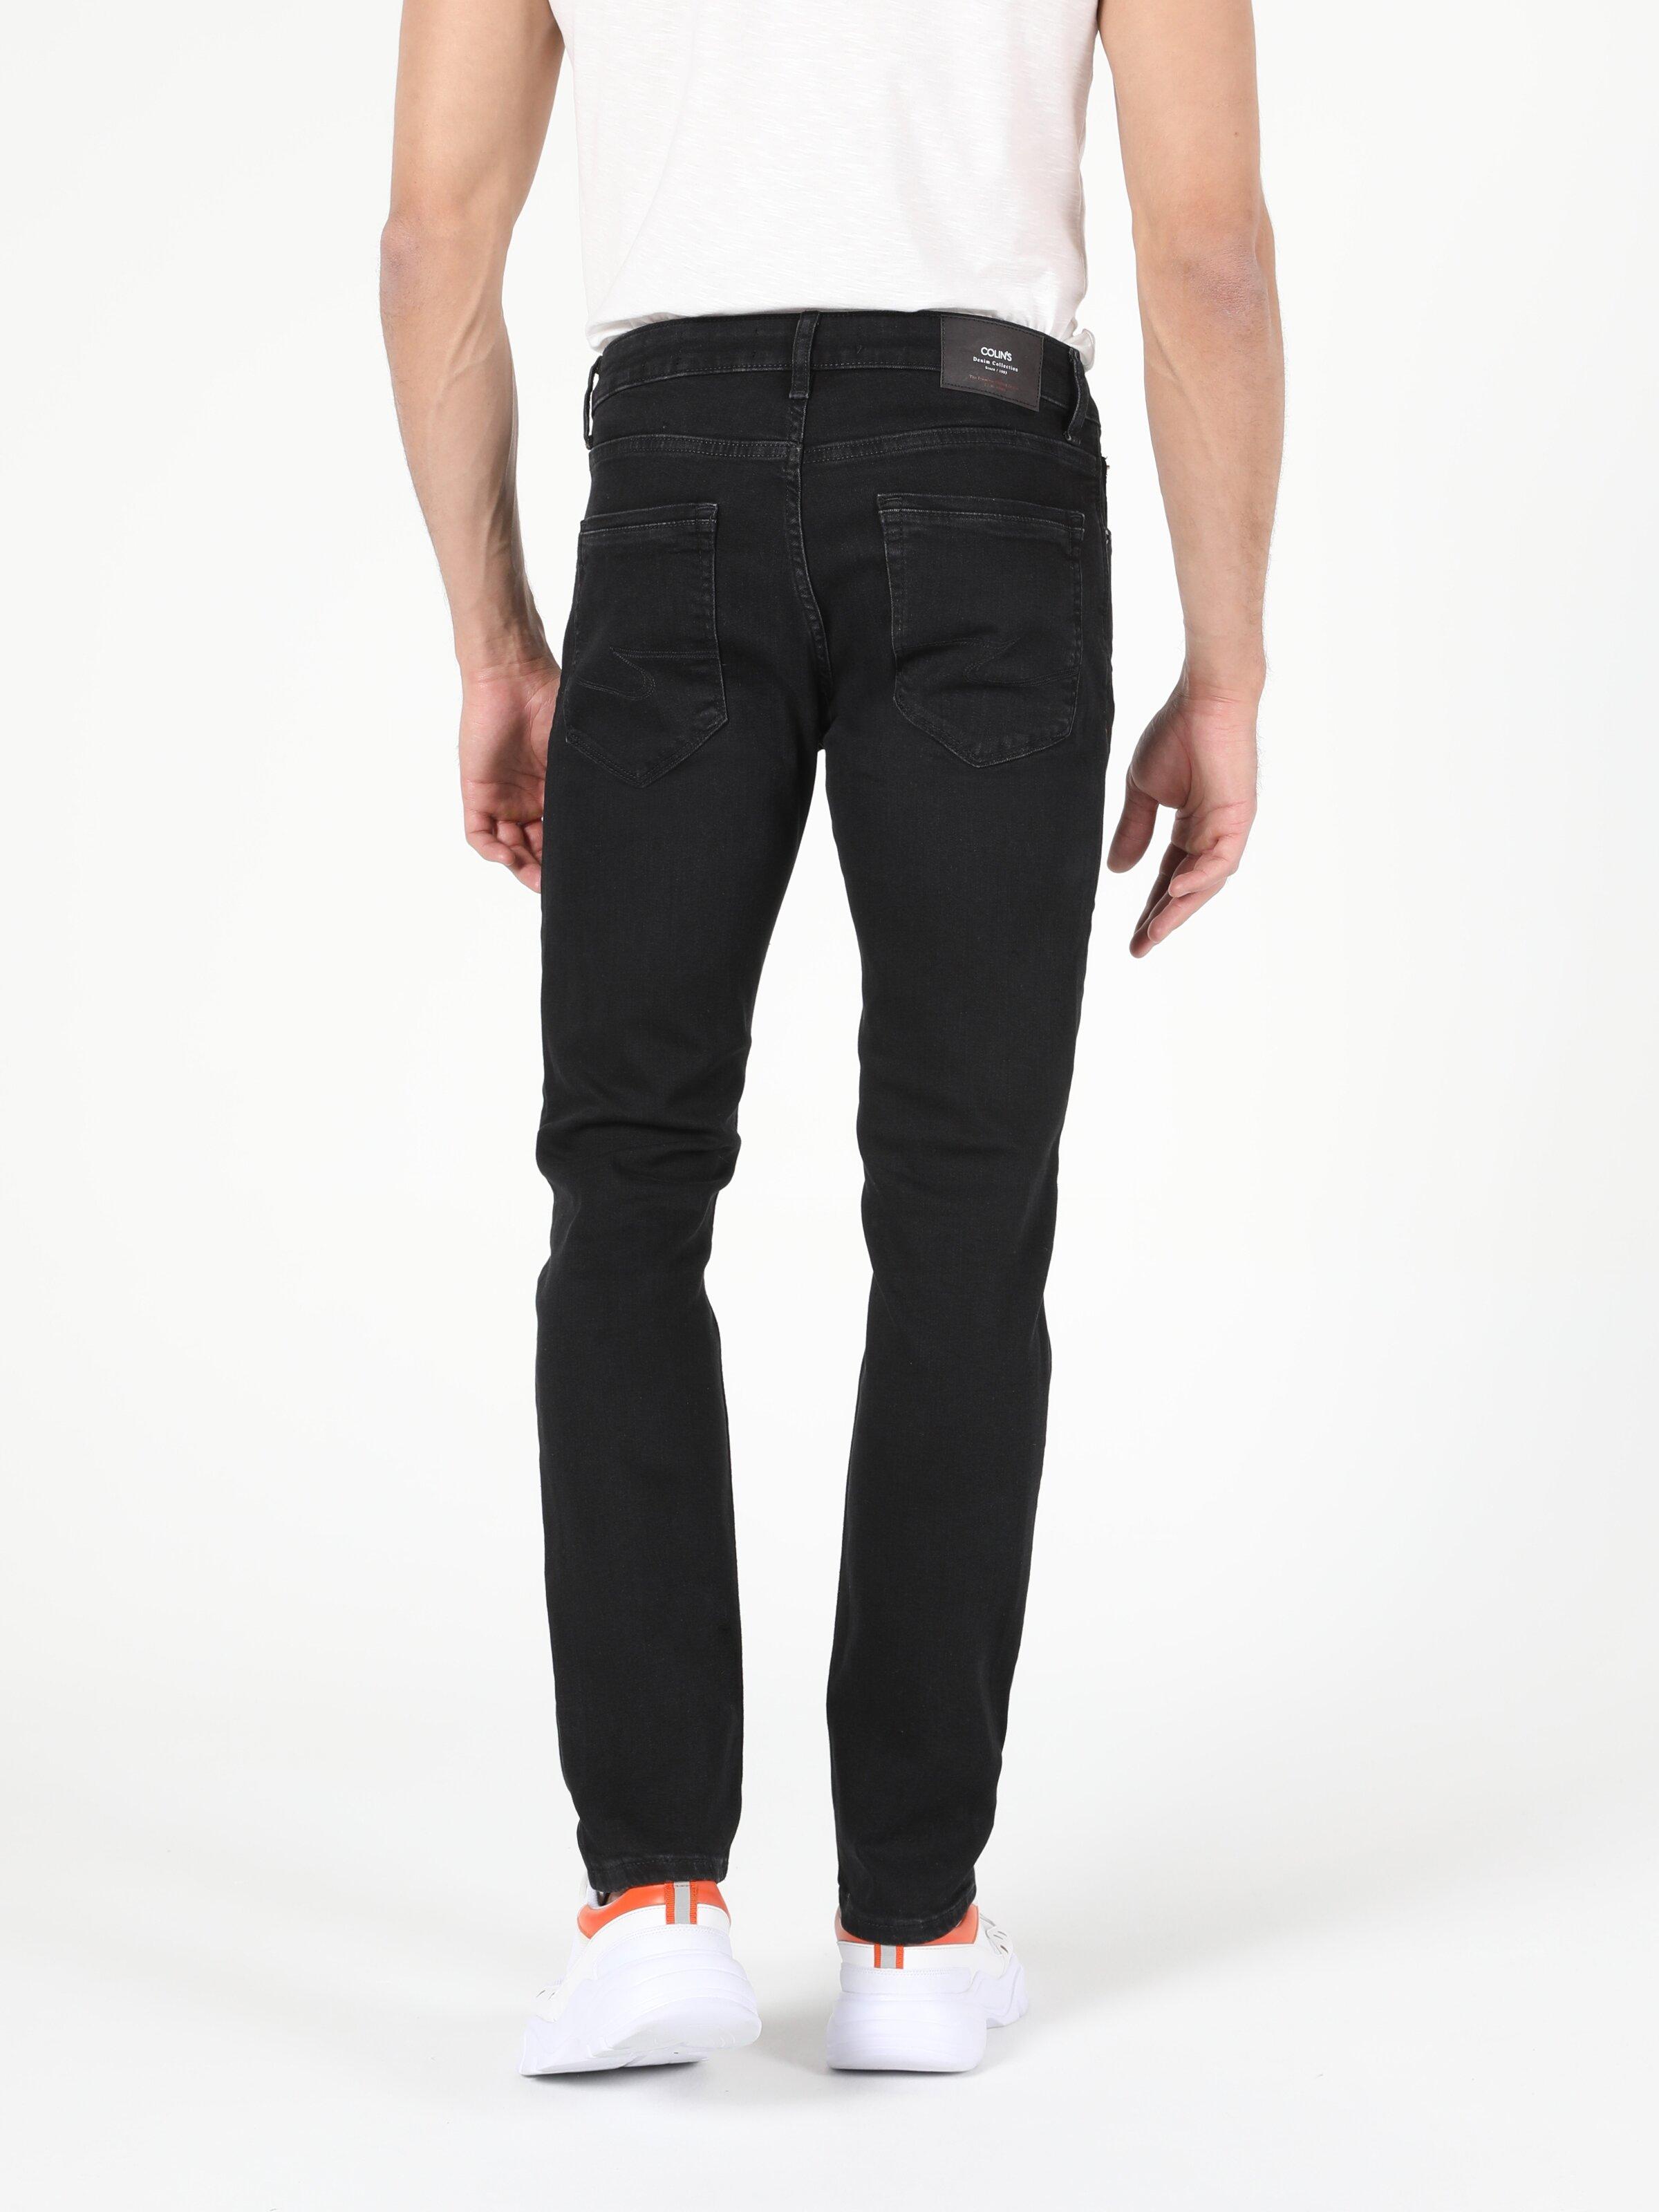 044 Karl Düşük Bel Düz Paça Straight Fit Siyah Erkek Jean Pantolon